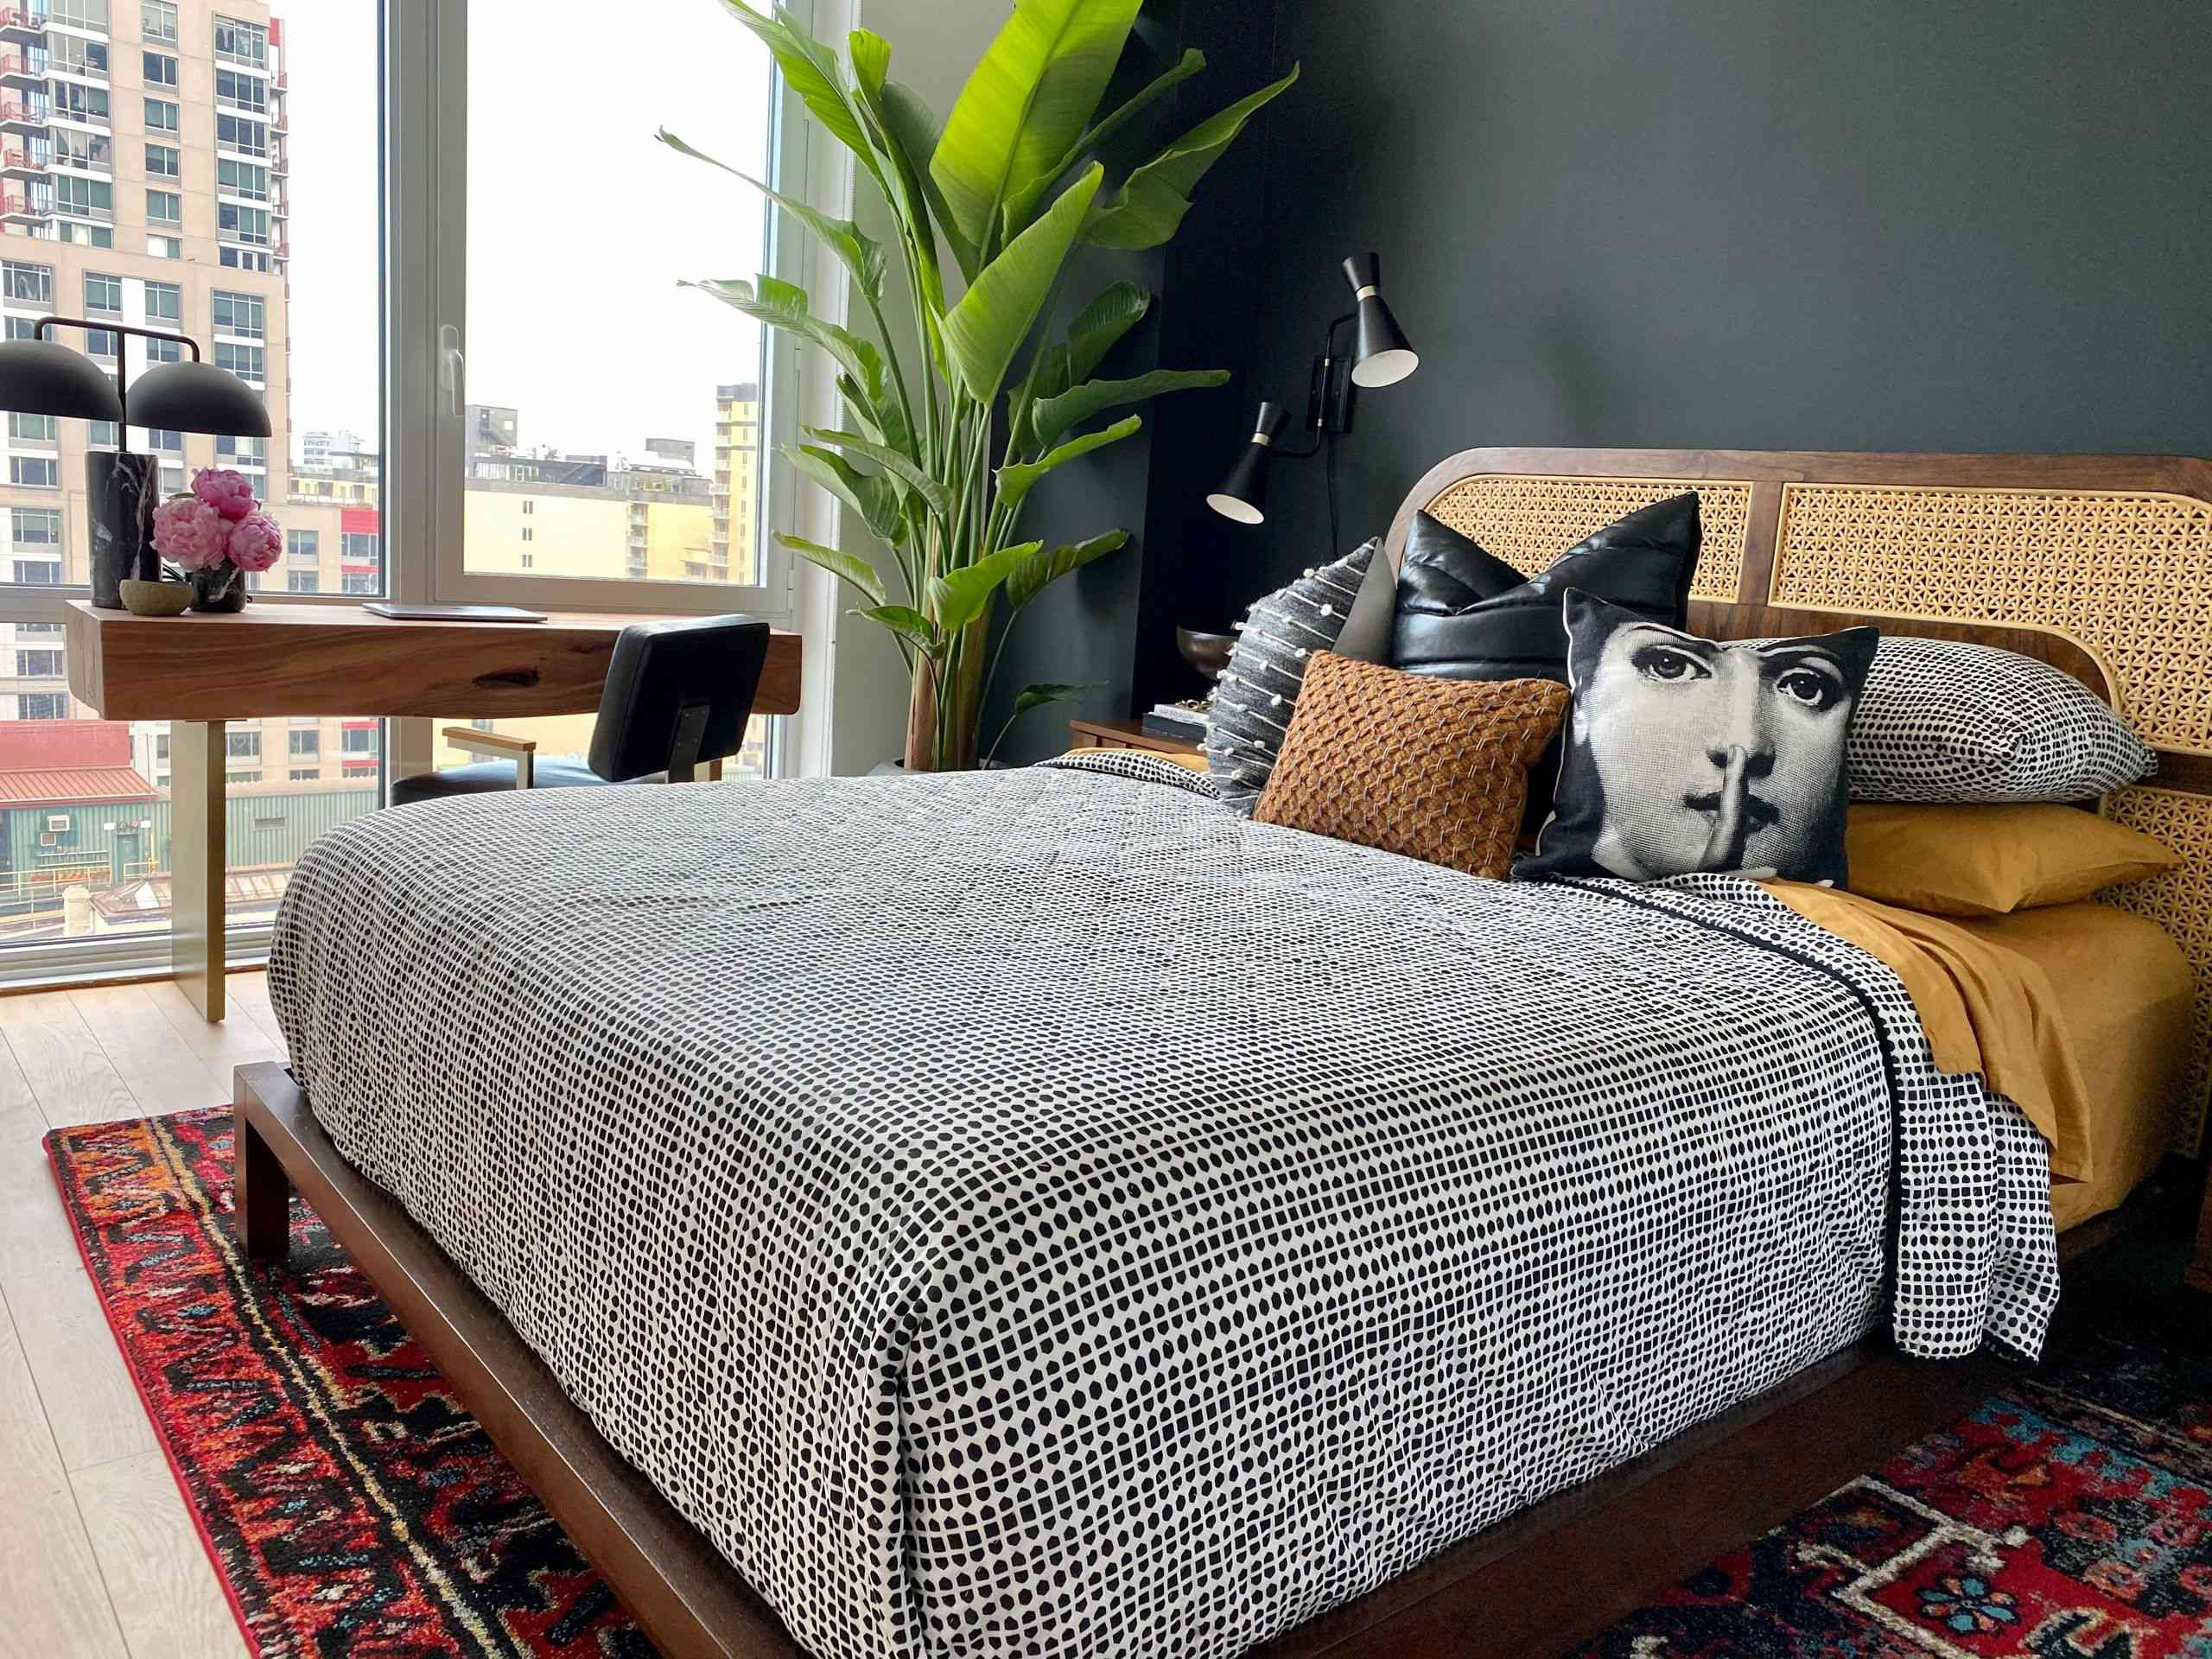 how to clean memory foam mattress